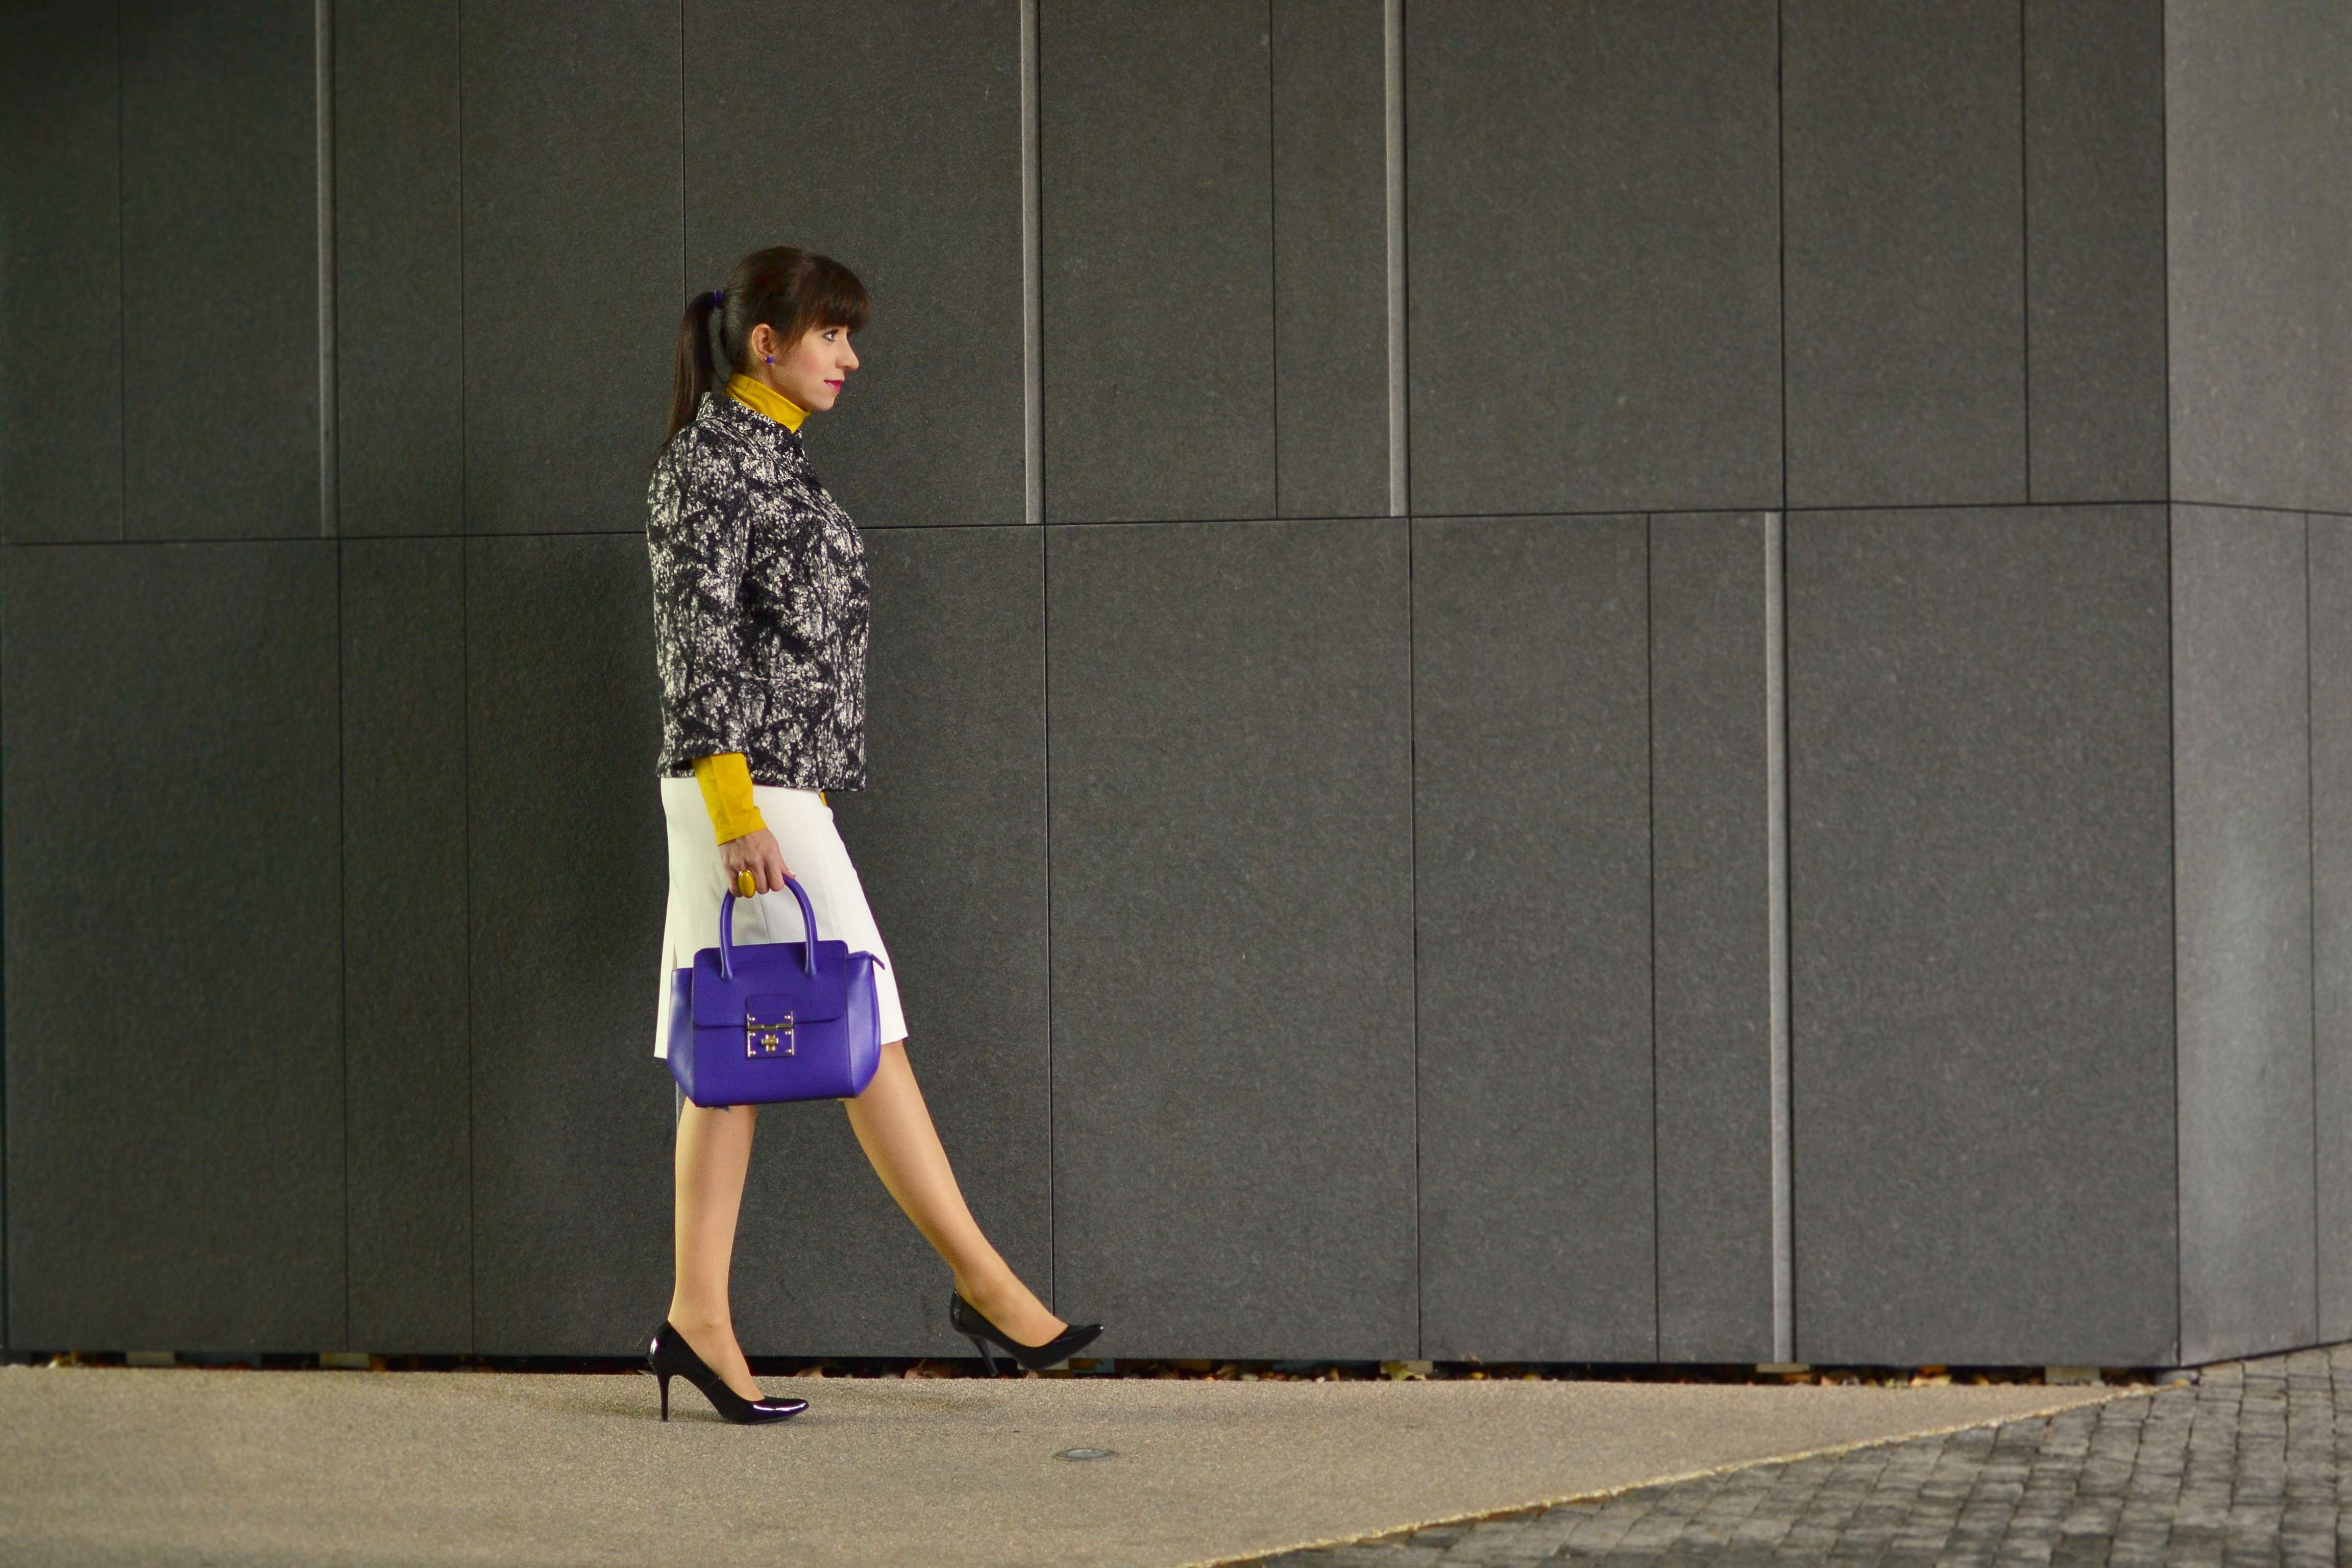 AKO MI VIZITKA OD ADVERTI ZACHRÁNILA SITUÁCIU_Katharine-fashion is beautiful_Žltý rolák_Fialová kabelka_Vizitky Adverti_Katarína Jakubčová_Fashion blogger